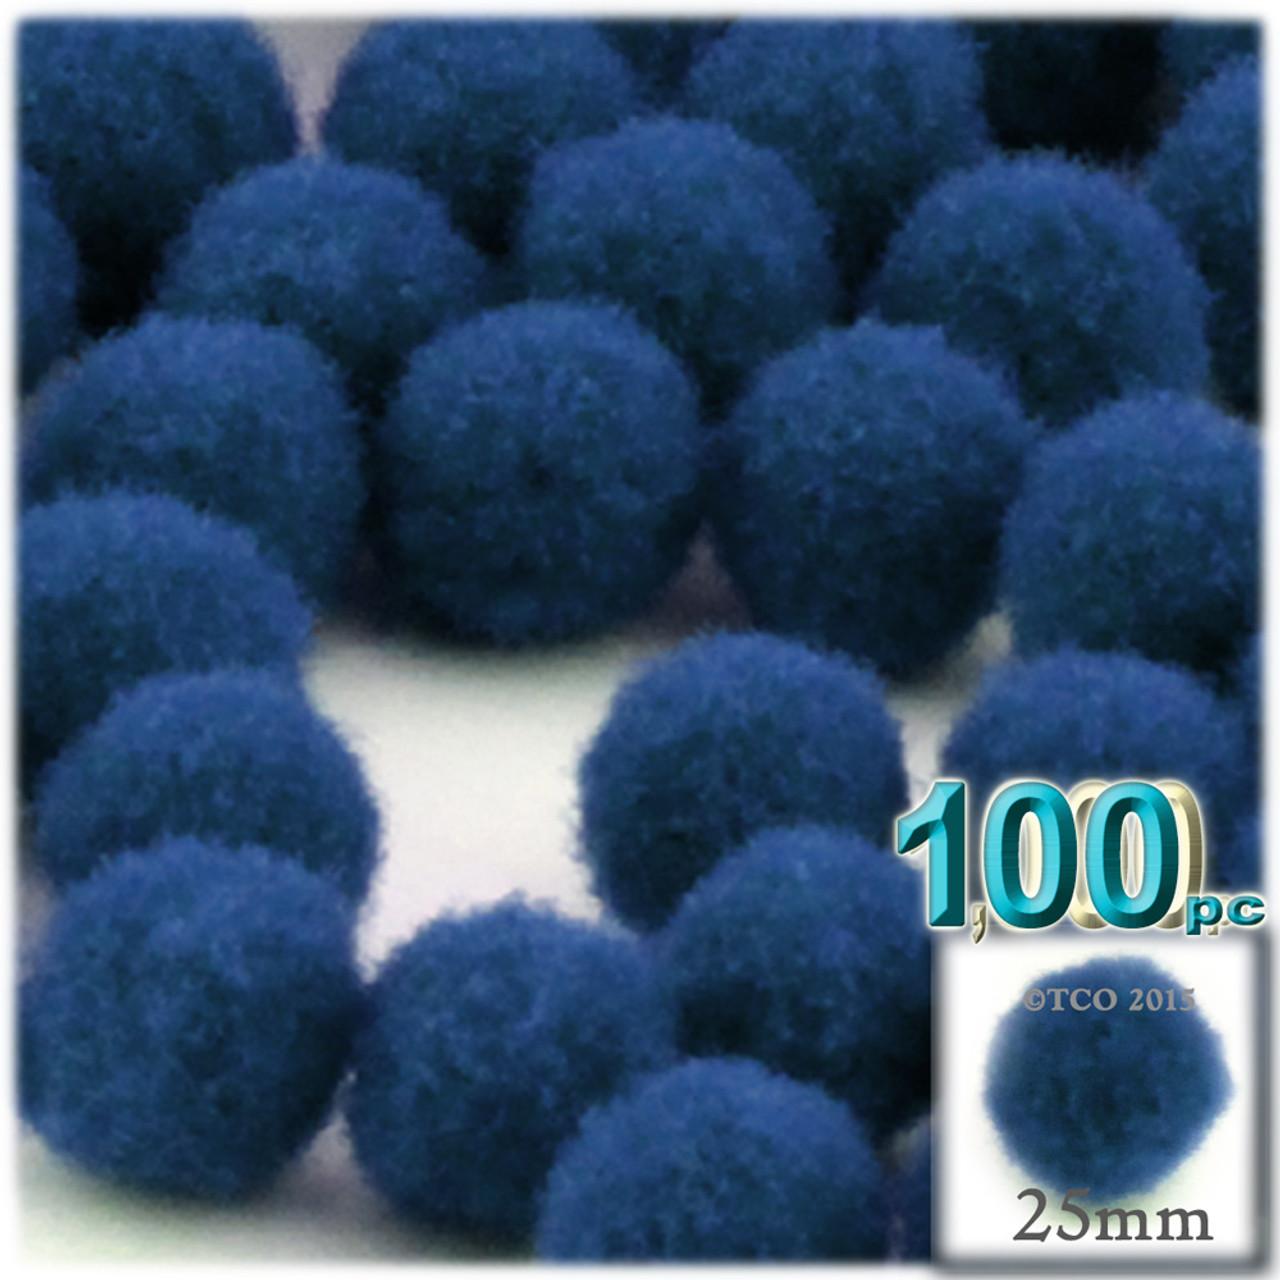 100 polyester 10 mm blue PomPoms